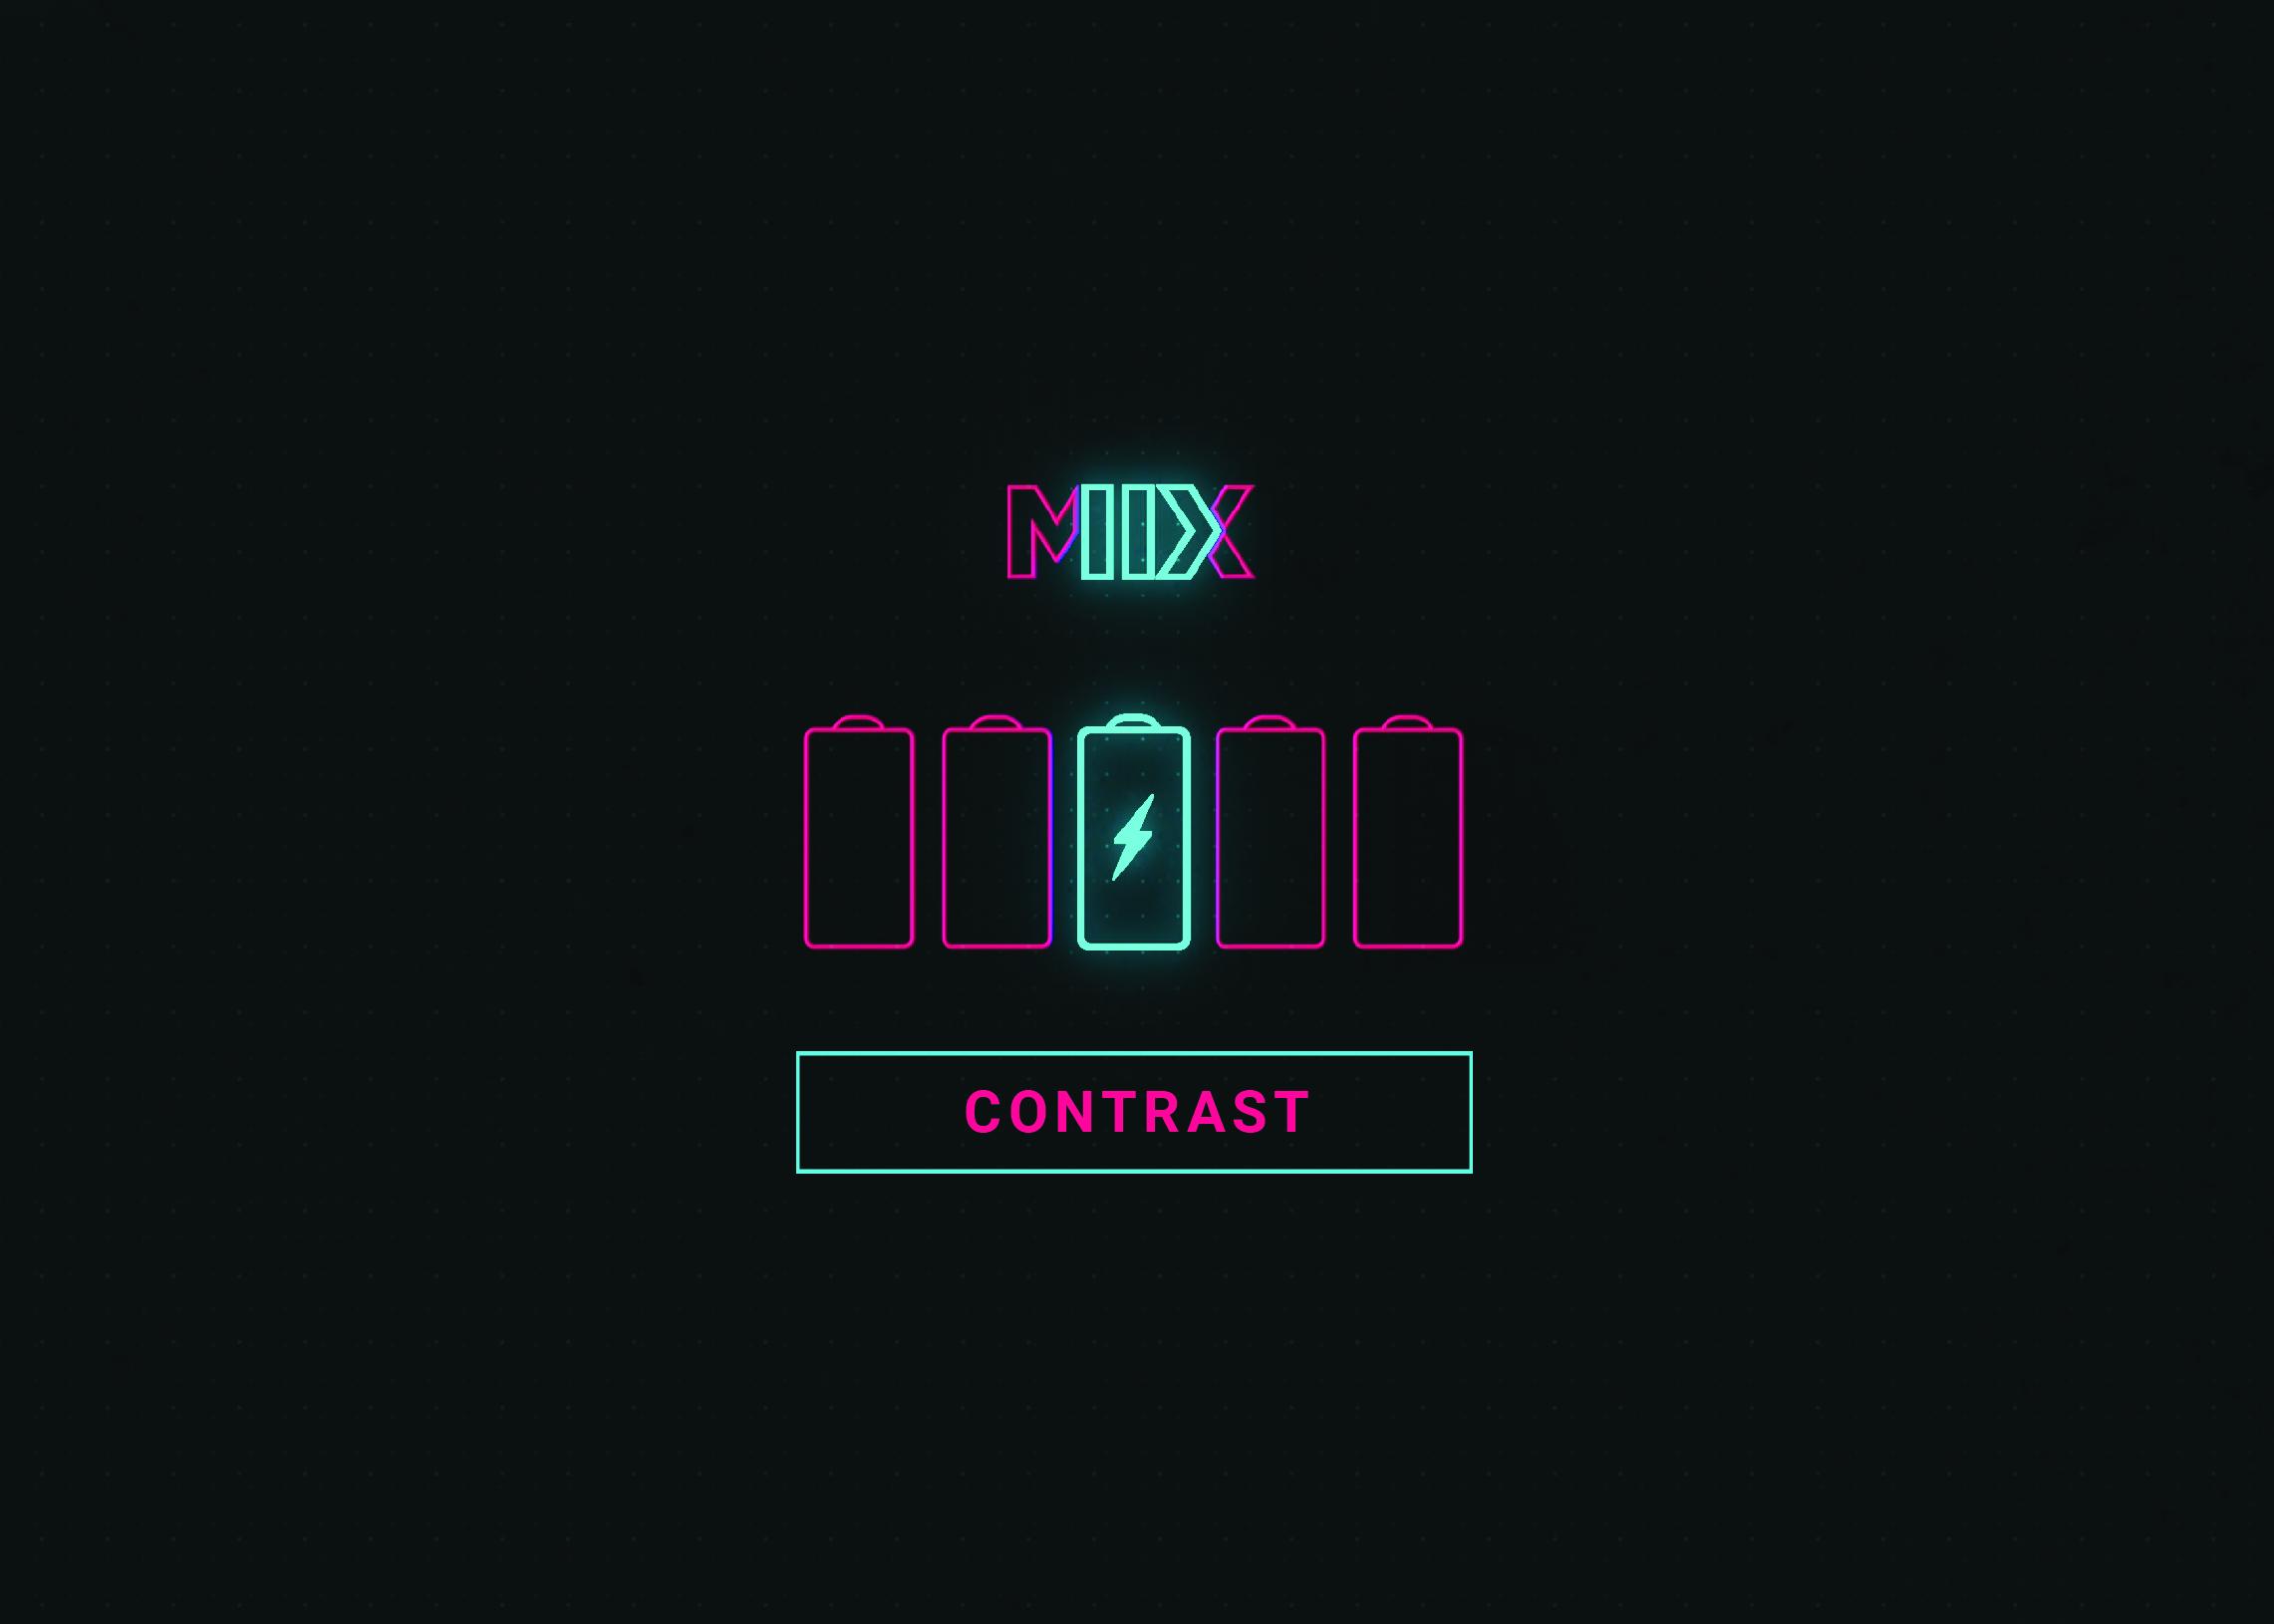 Mix card 5x7